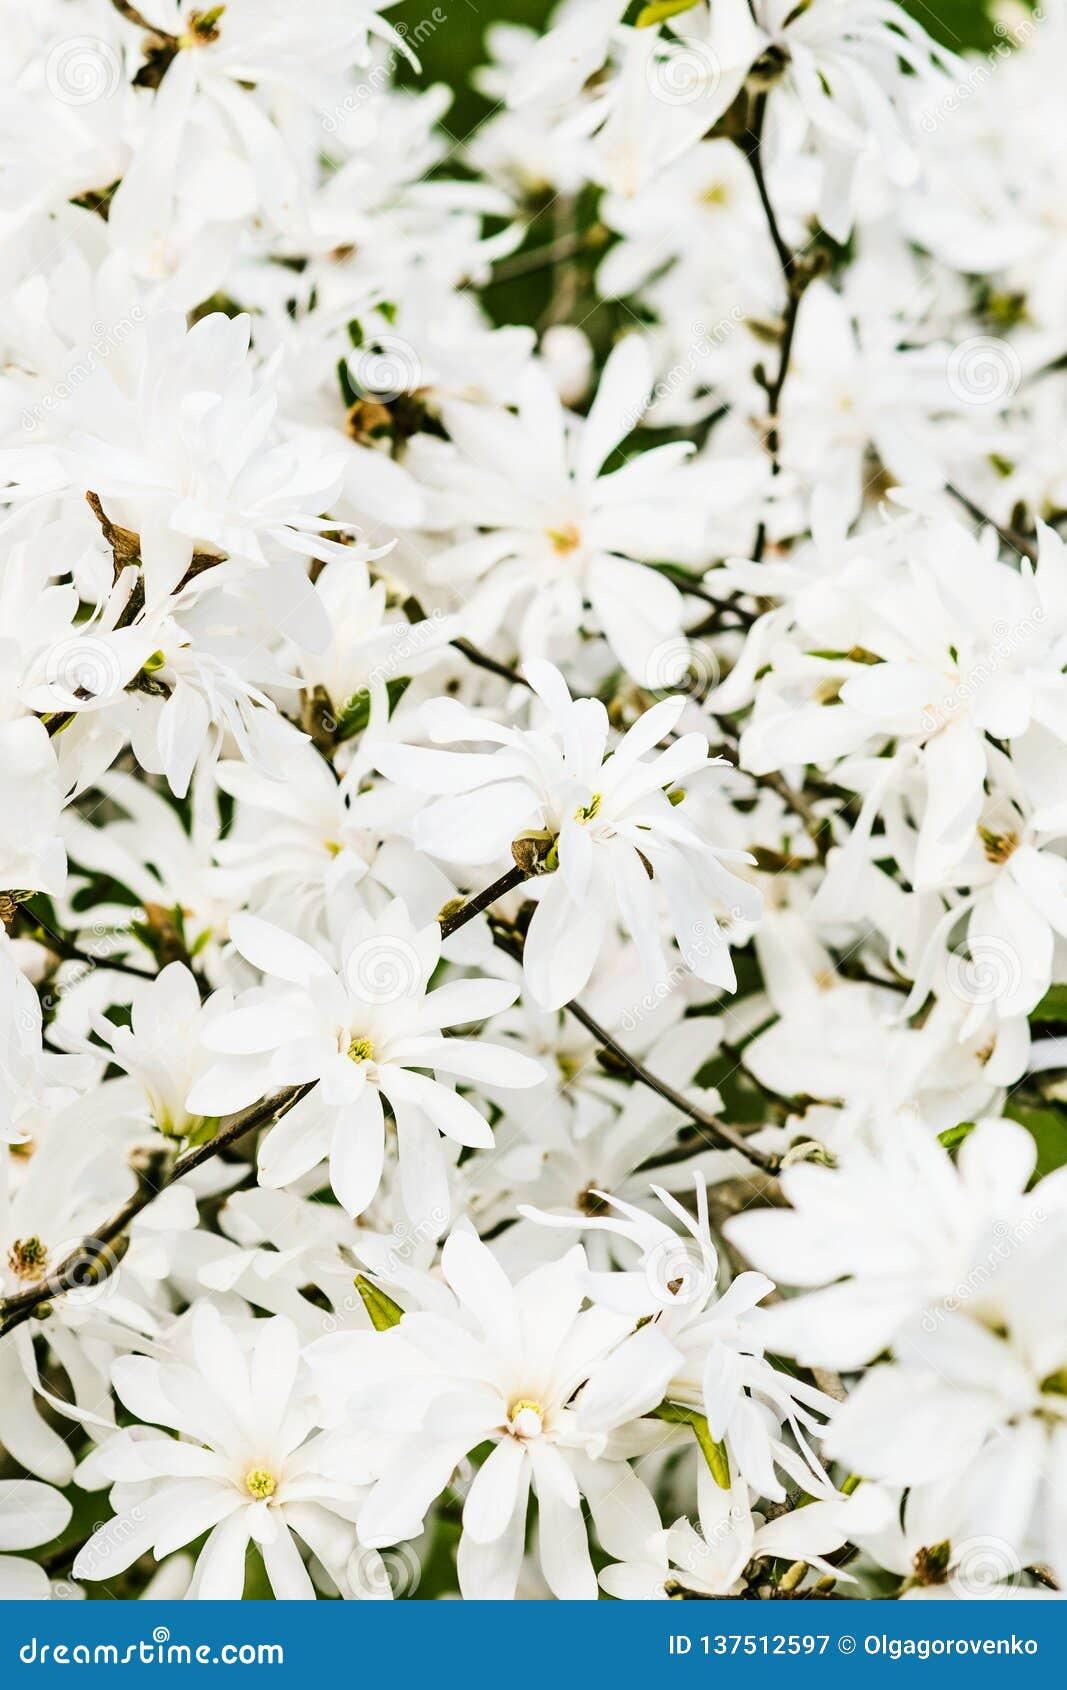 WHITE MAGNOLIAS FLOWERS IN FRAMES  Wallpaper Border Wall Decor DAISY